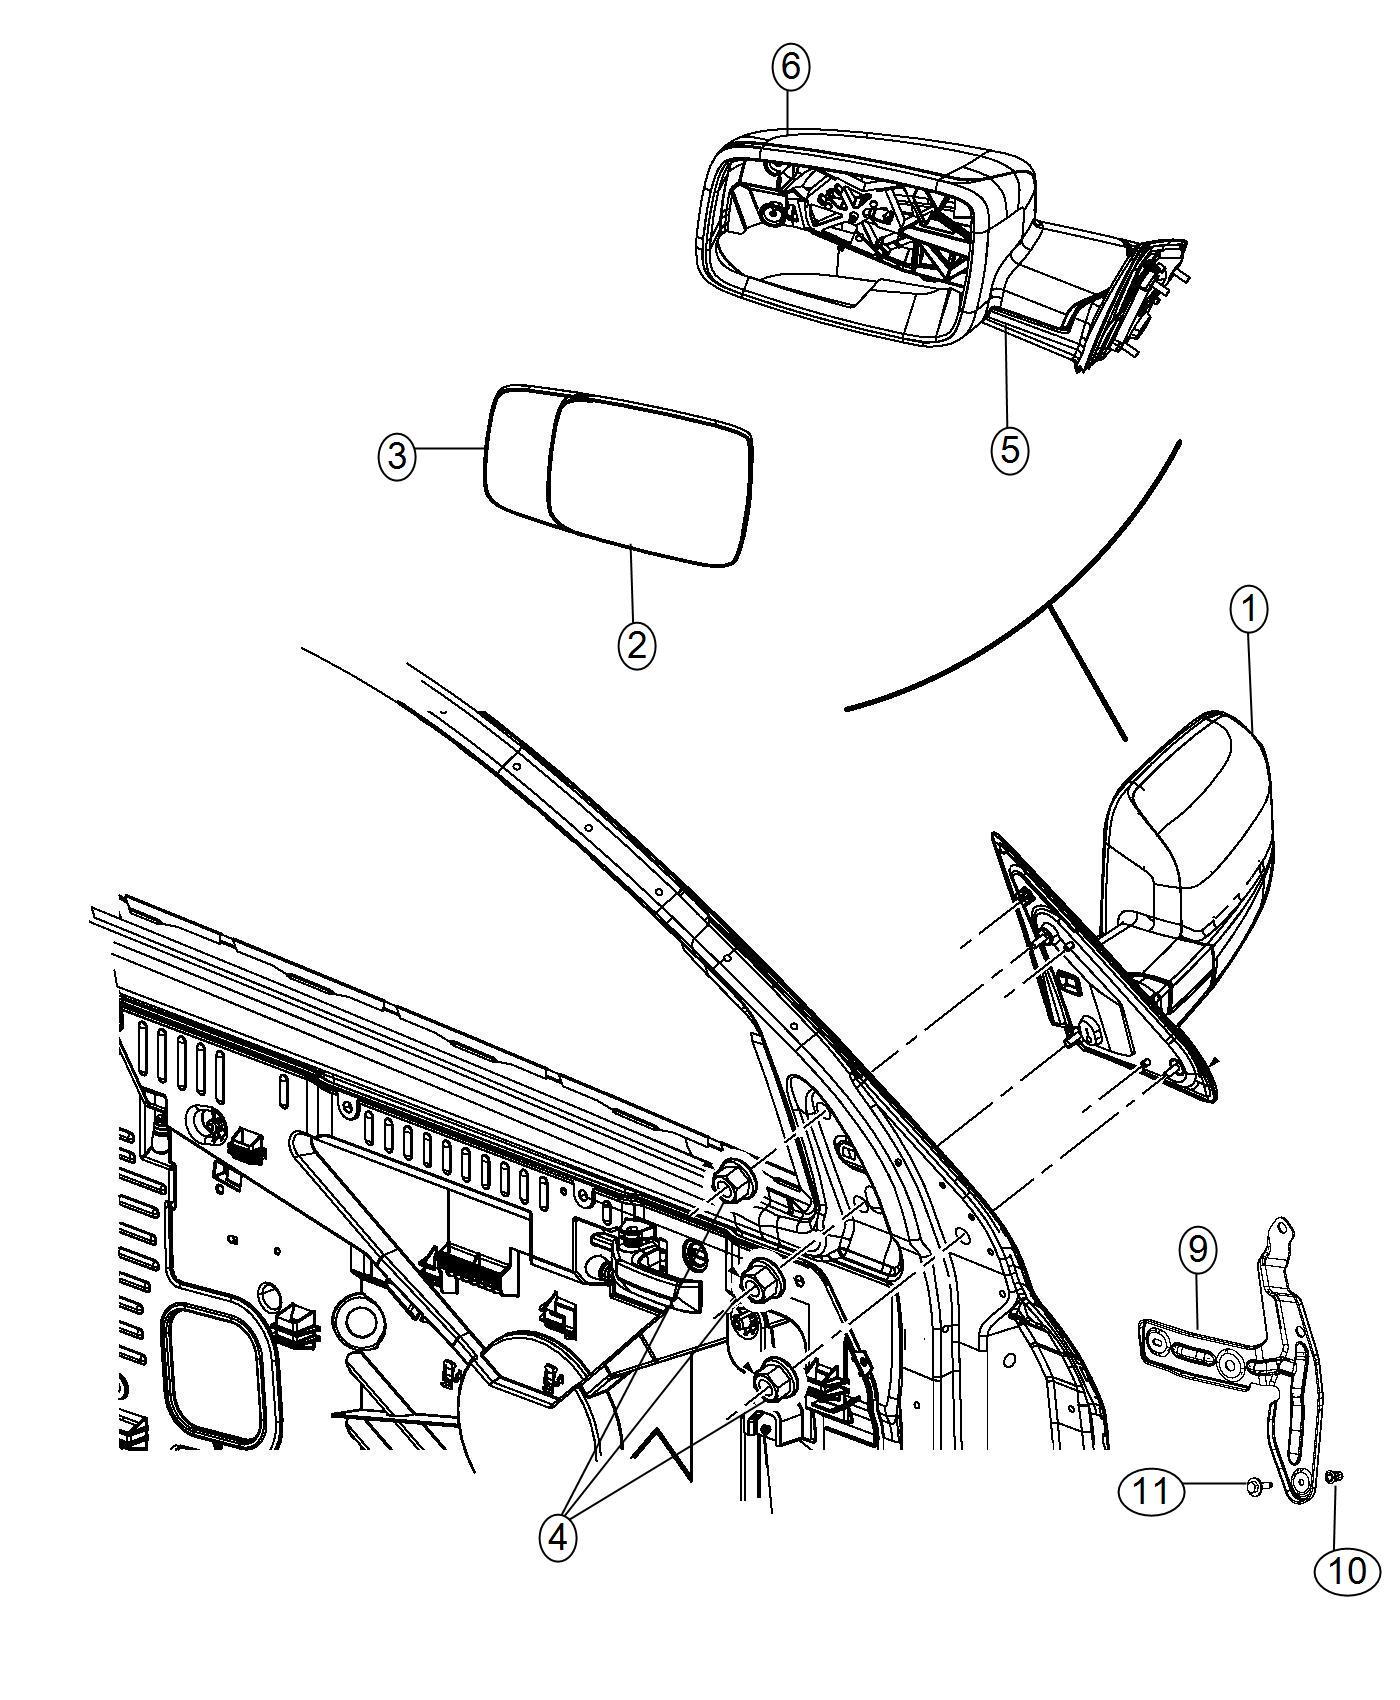 RAM 1500 Mirror. Left. Outside rearview. Gpd, leg